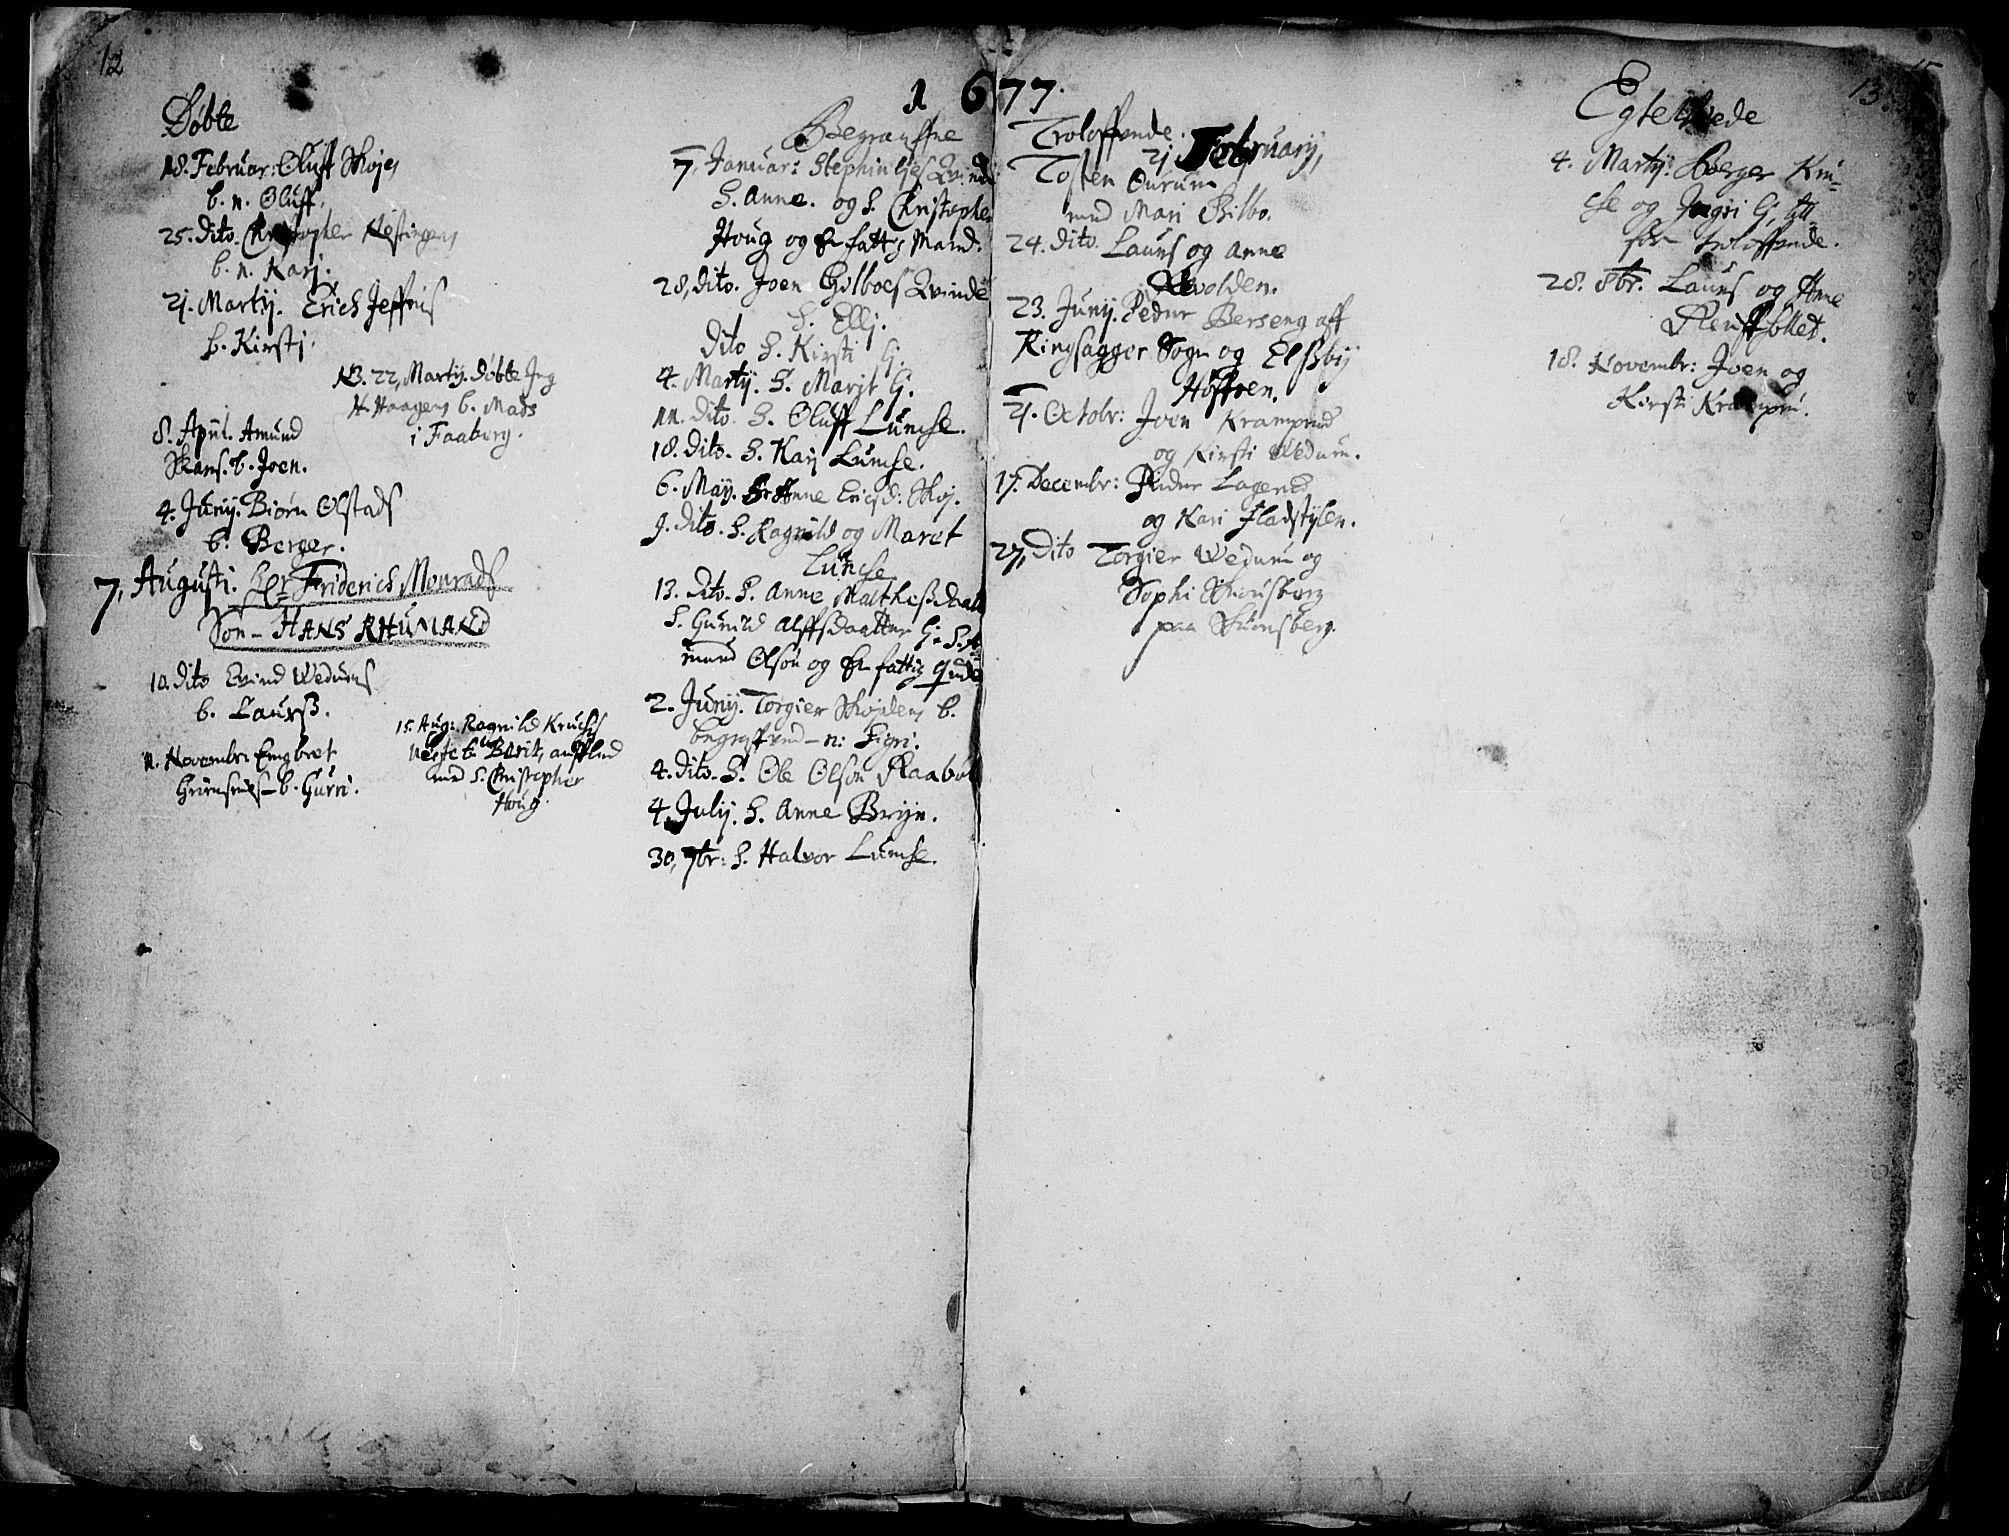 SAH, Øyer prestekontor, Ministerialbok nr. 1, 1671-1727, s. 12-13